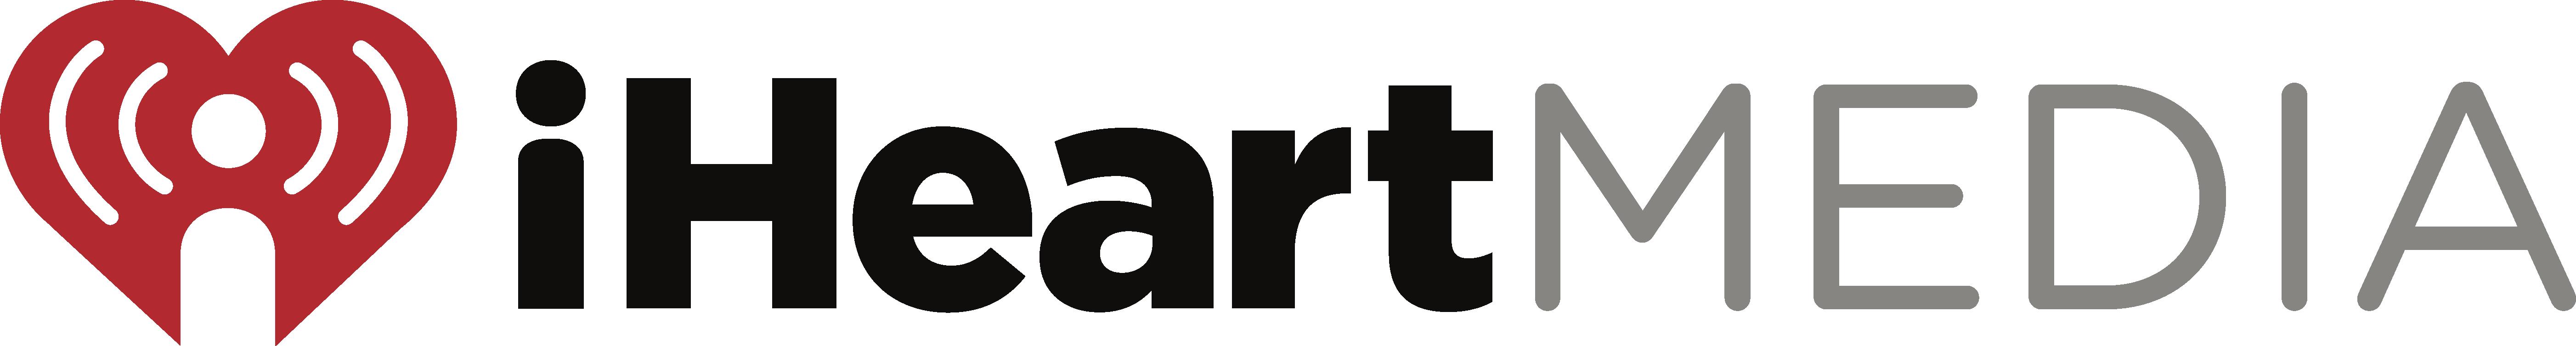 iheartradio logo vector - photo #11